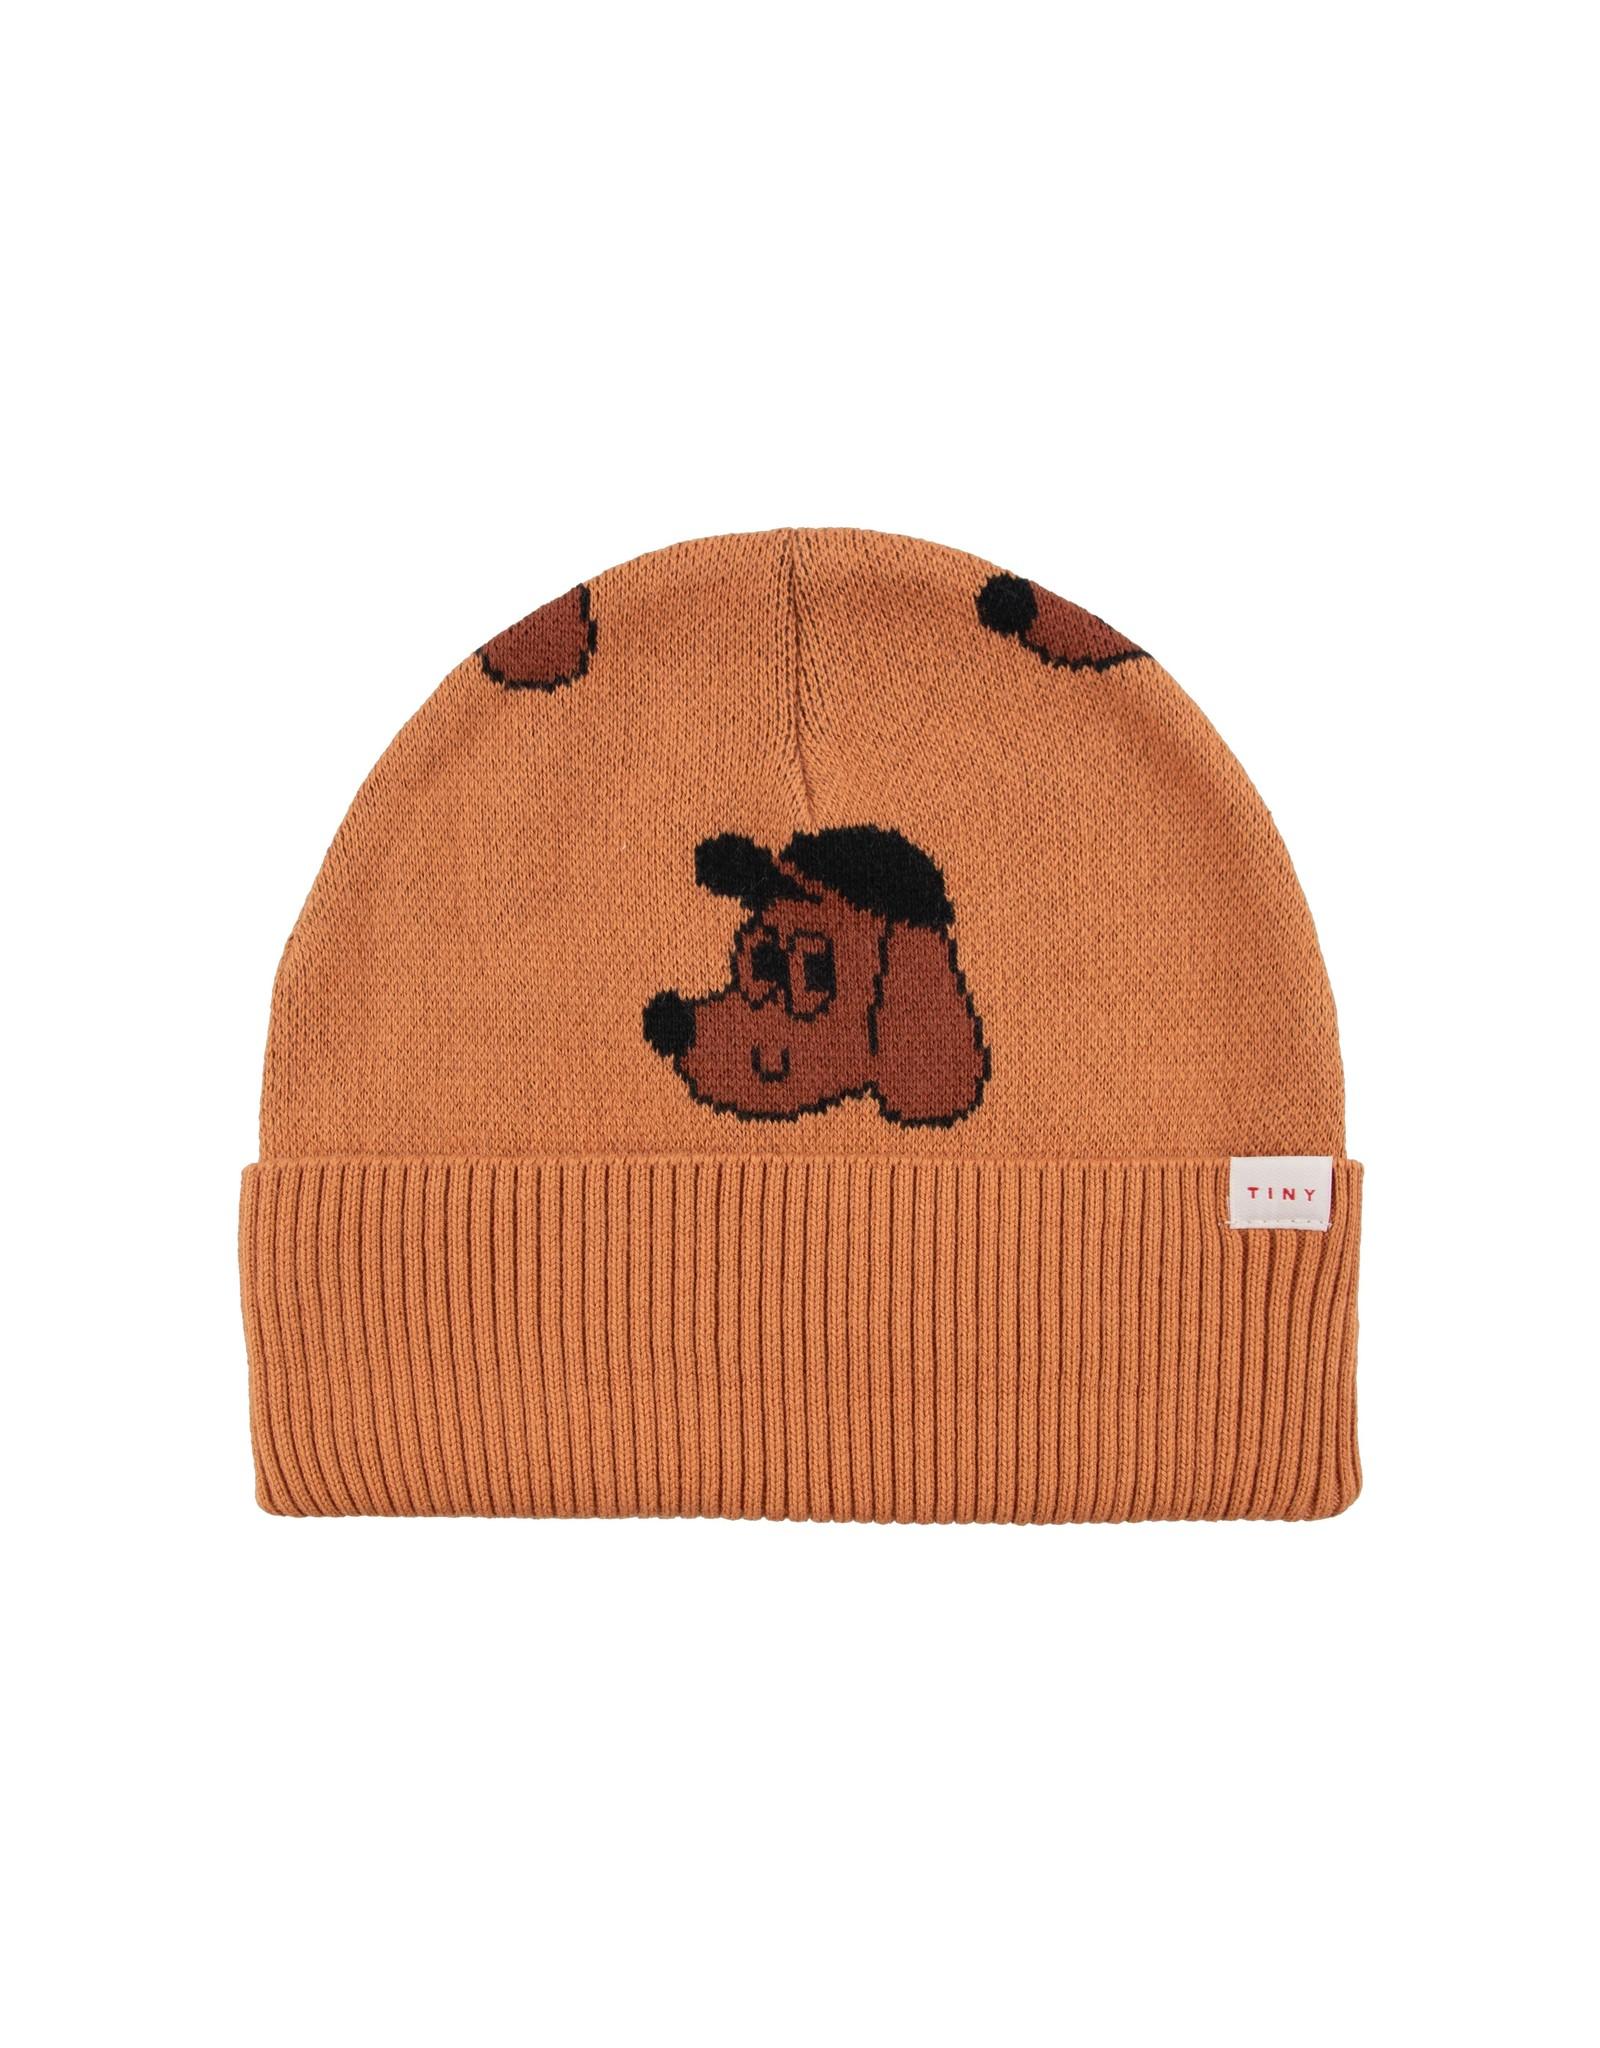 Tinycottons Dog Beanie